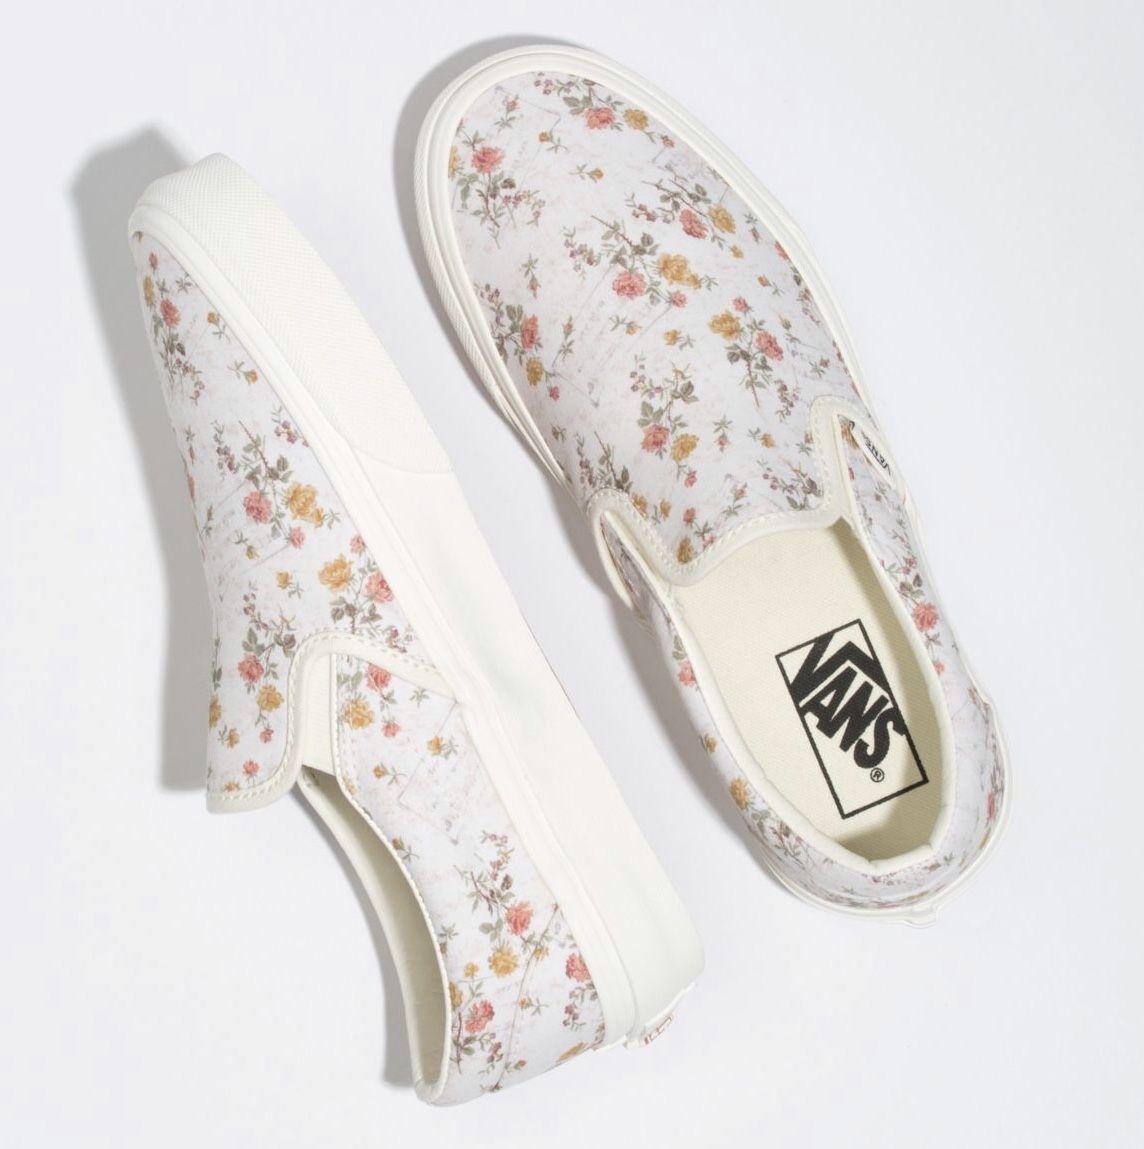 Vans Slip on - Floral/Marshmallow 2019